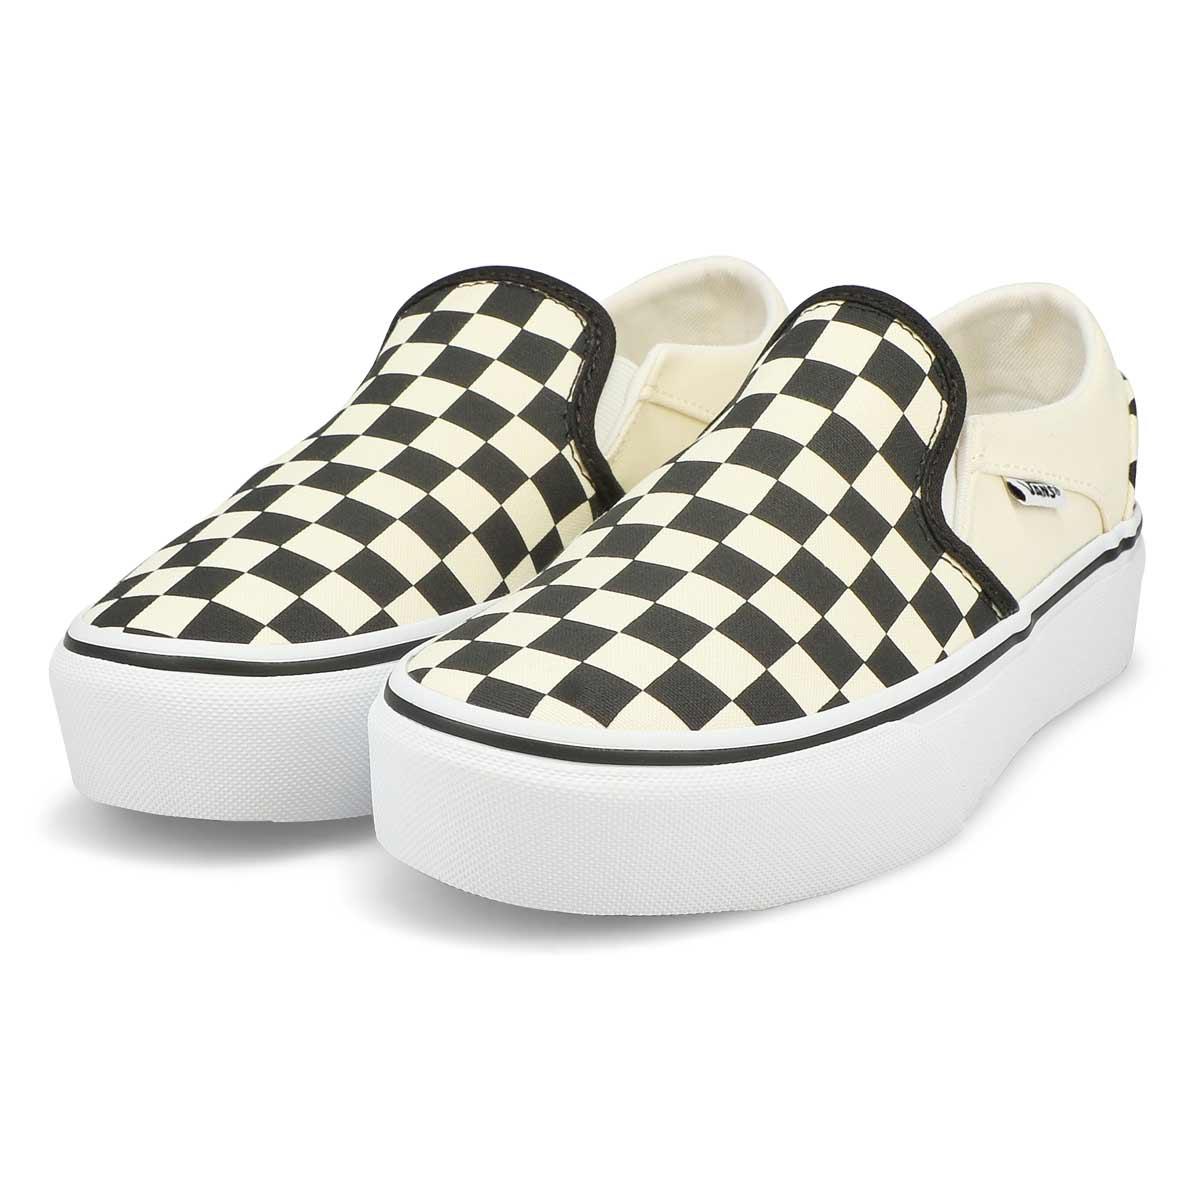 Women's Asher Platform Sneaker -Blk/Wht Checkered